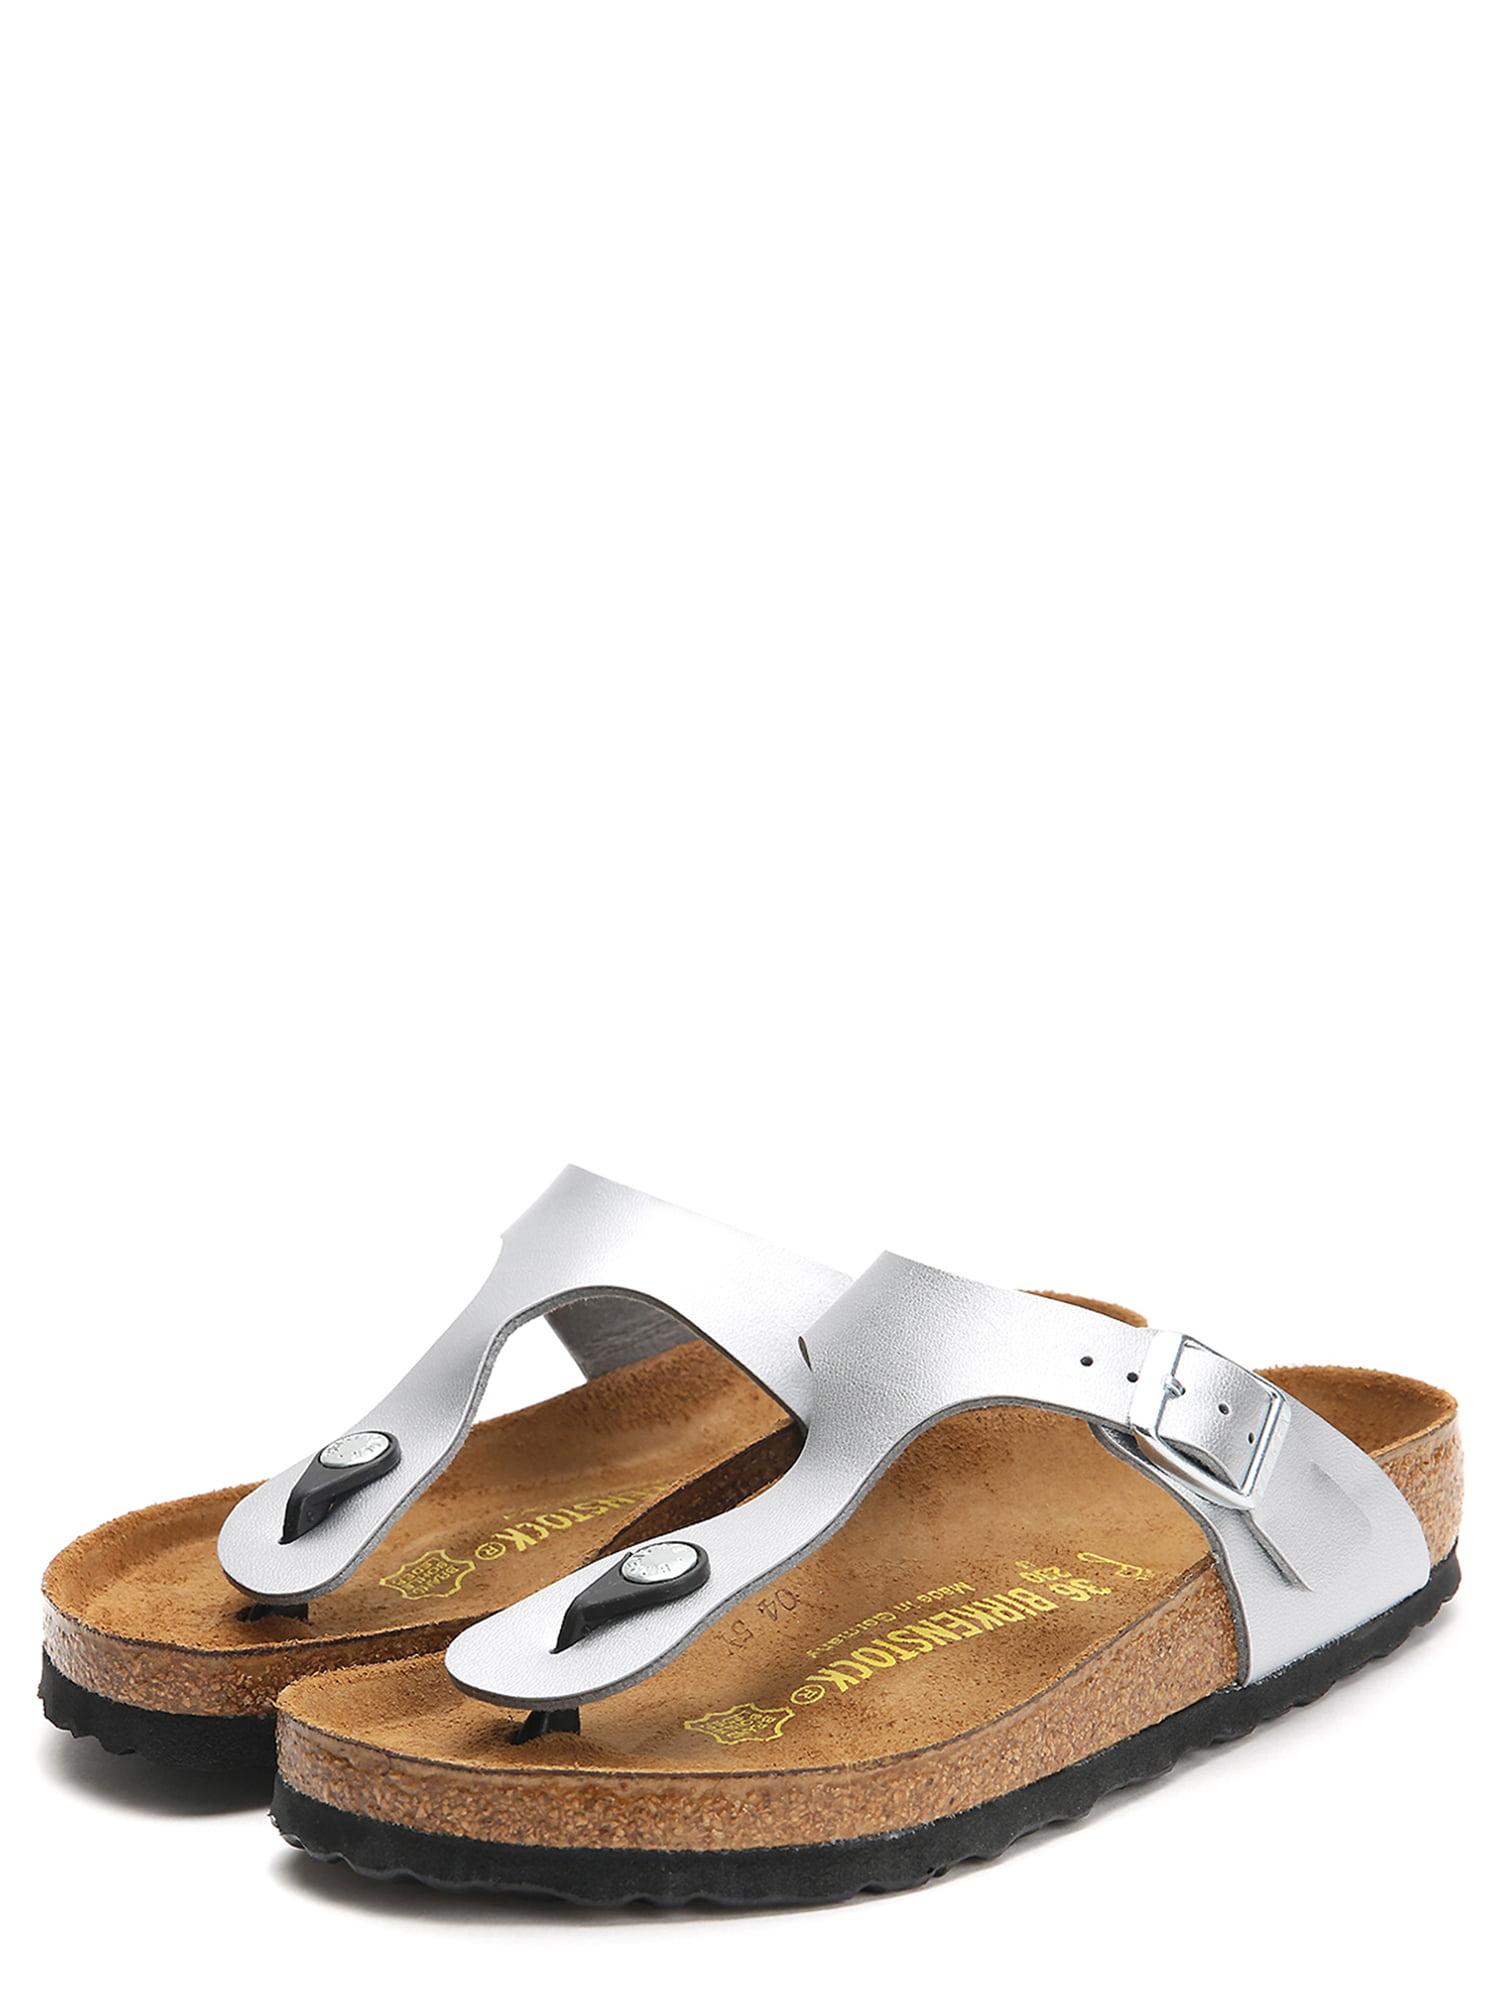 Birkenstock Gizeh Leather Cork U Silver Ankle-High Leather Sandal 8M   6M by Birkenstock